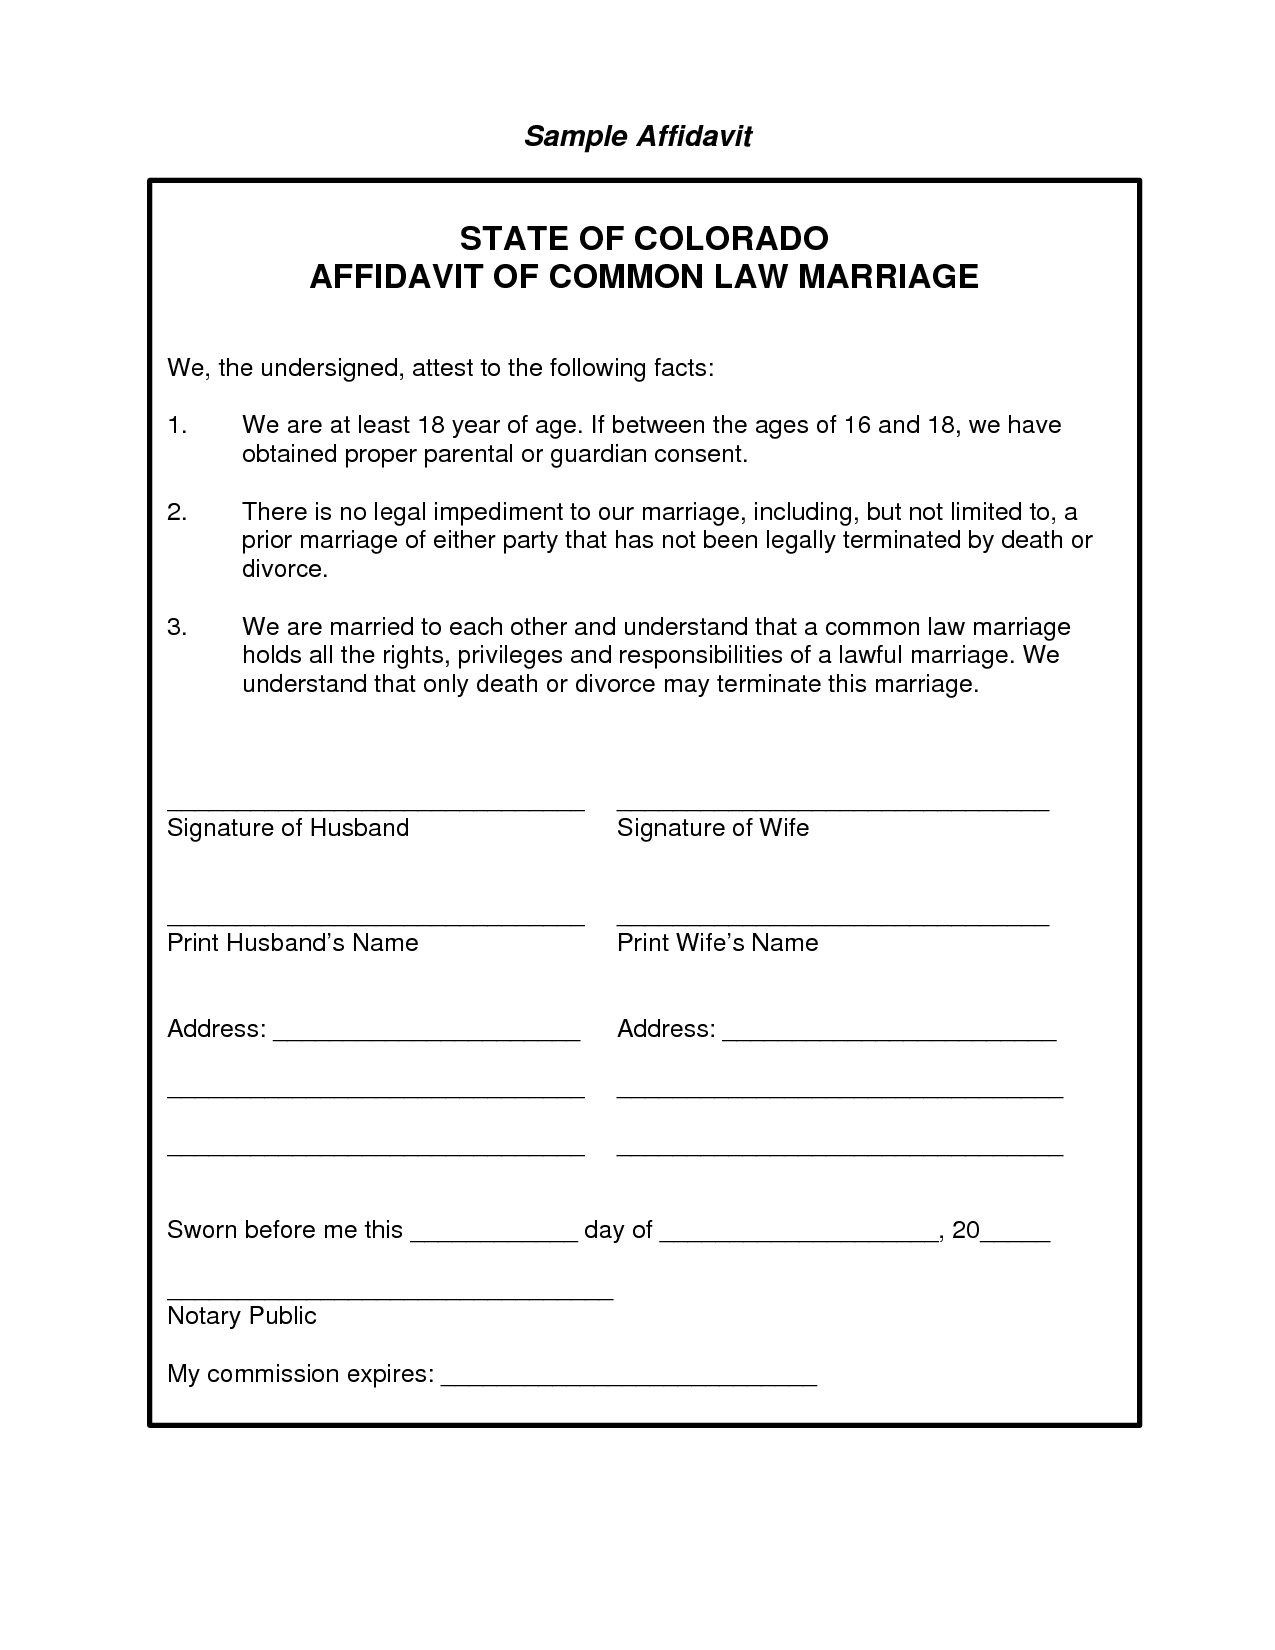 Doc415537 Affidavit Word Template Affidavit Form 83 Related – Affidavit Form Free